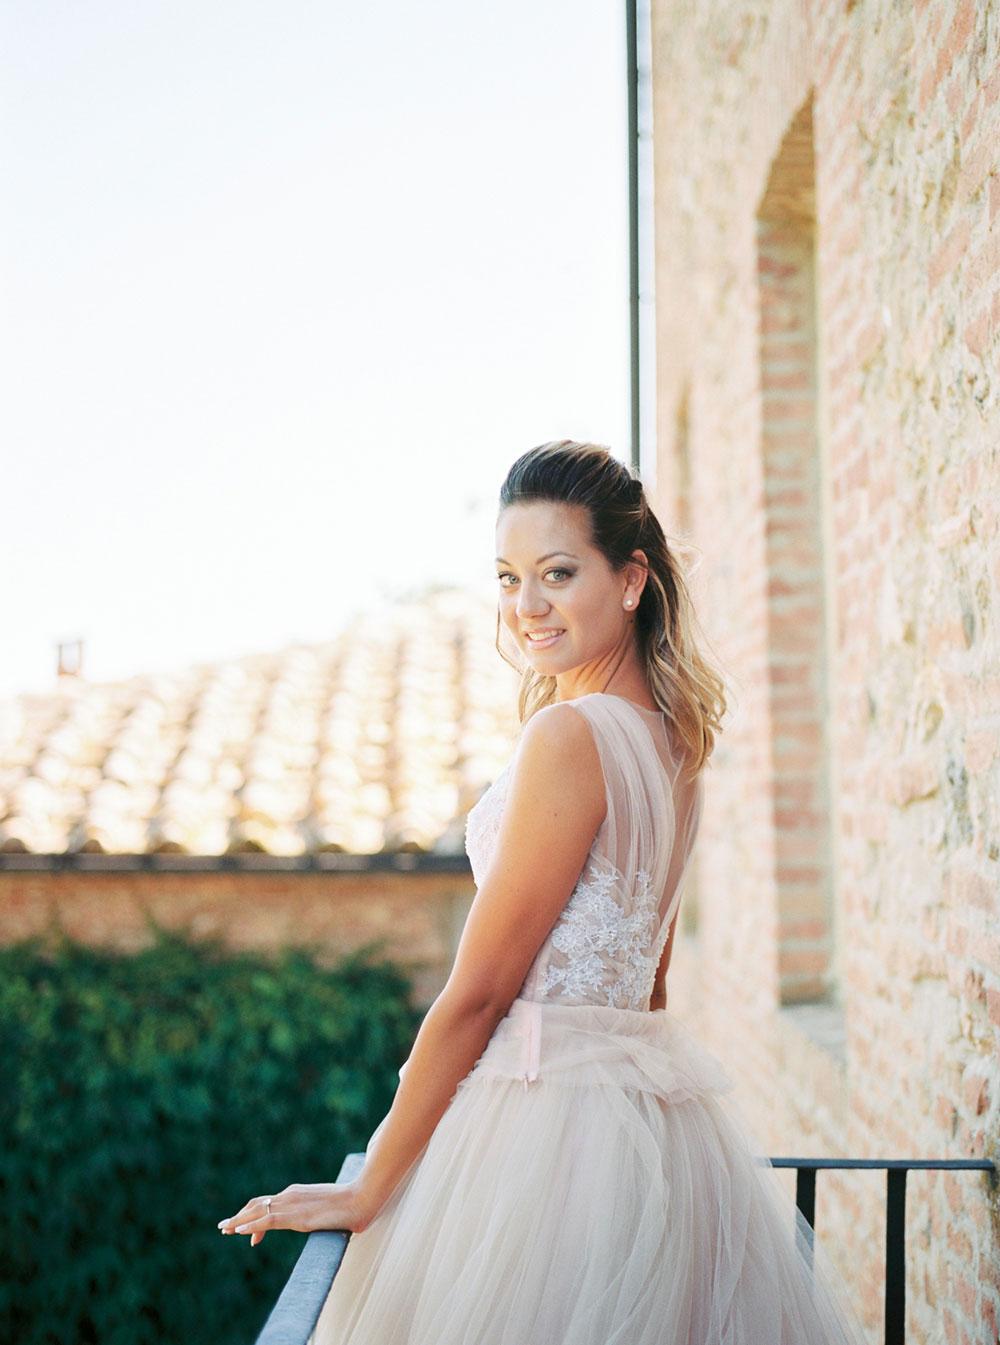 Linari-Tuscany-Elopement-Courtney-Michaela-80